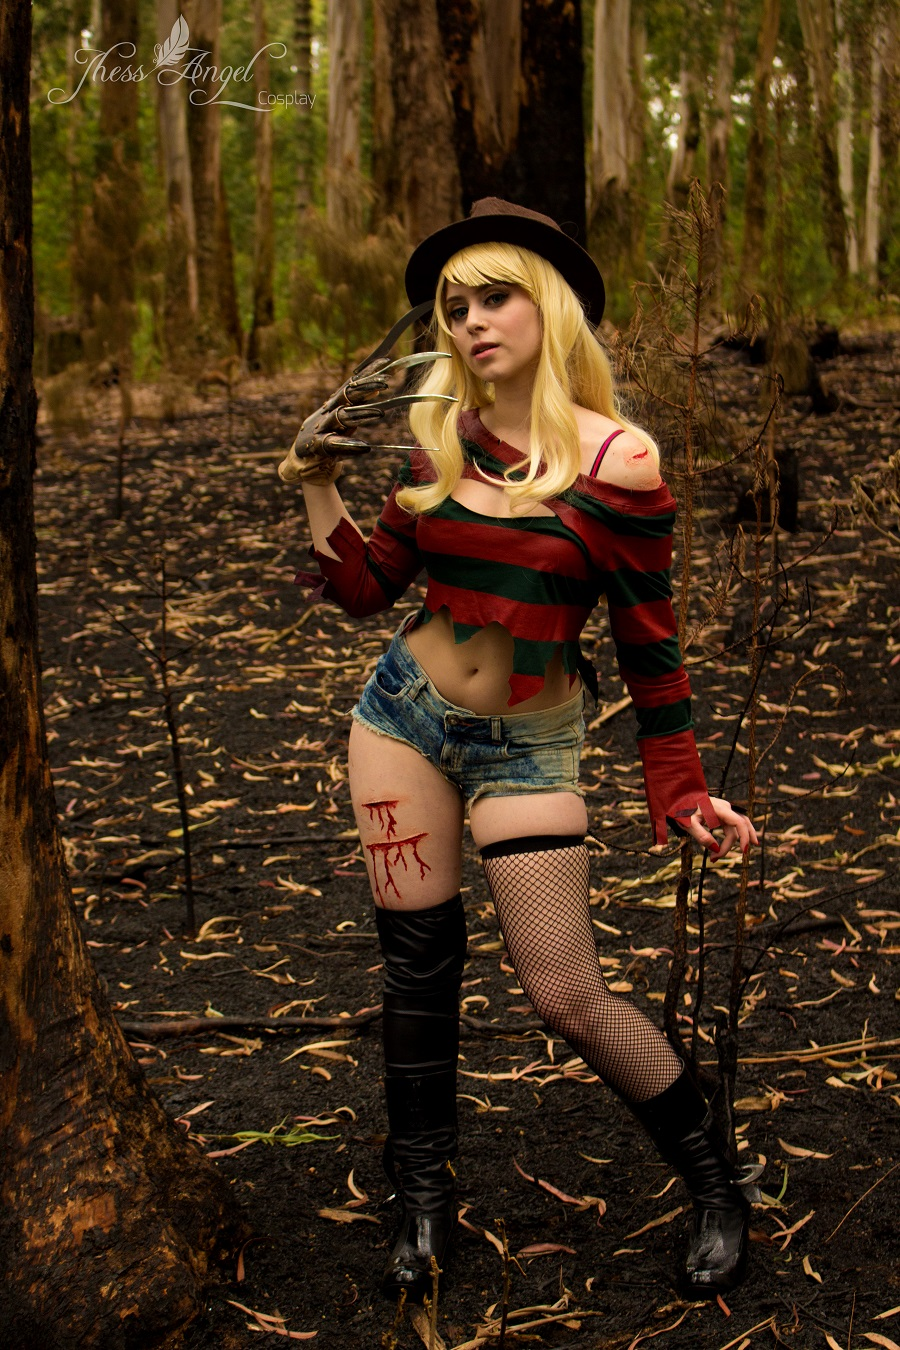 Freddy-Bishoujo-cosplay (6)